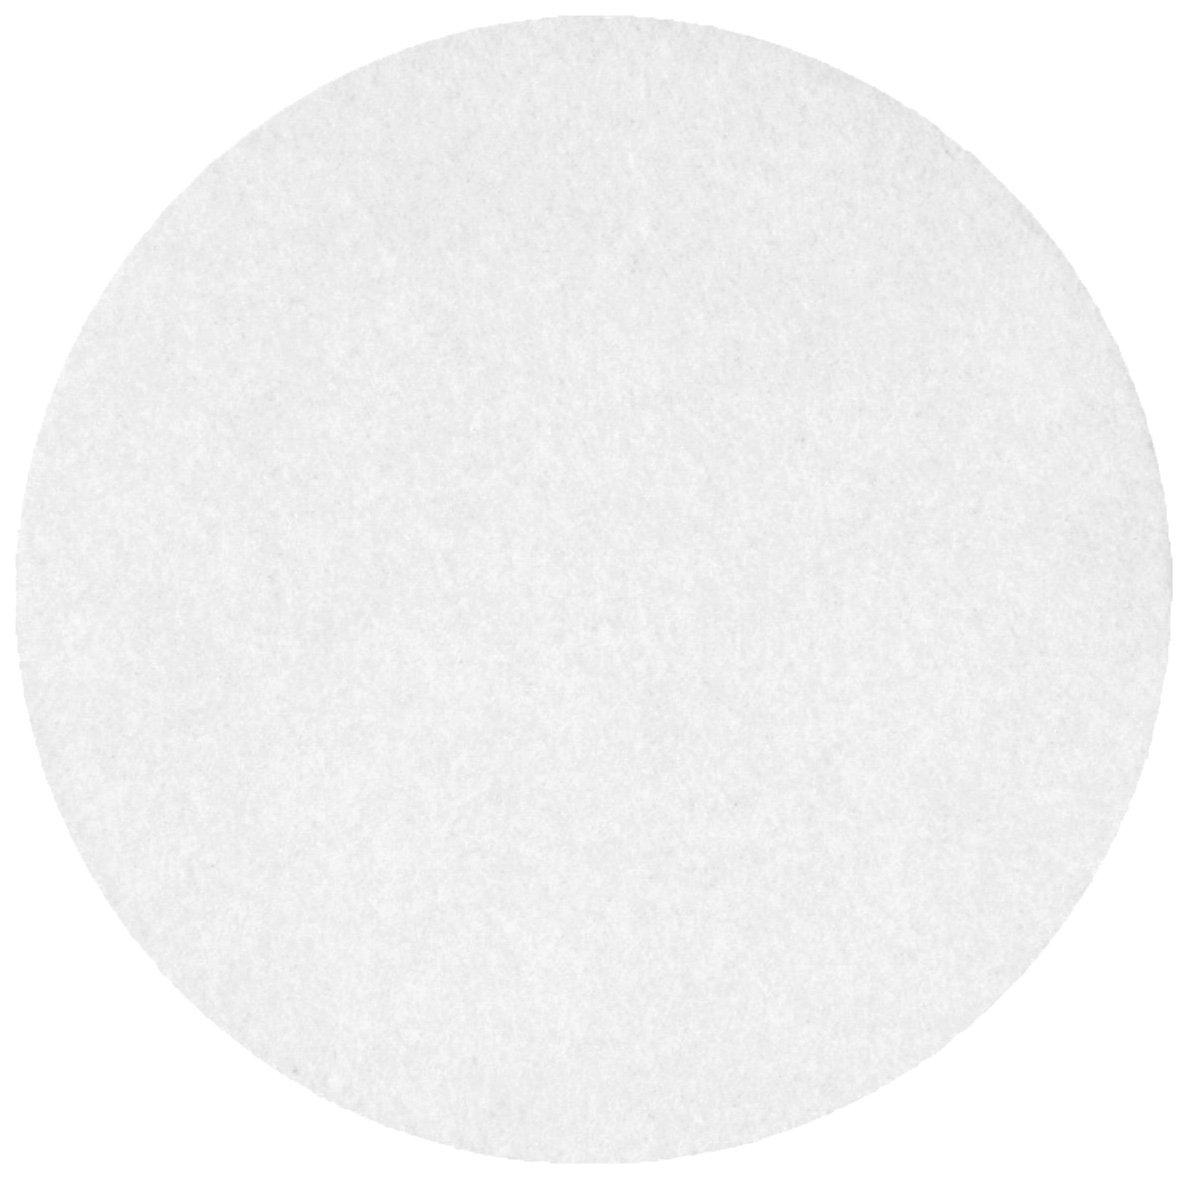 Whatman 10311804 Quantitative Filter Paper Circles, 4-7 Micron, Grade 597, 45mm Diameter